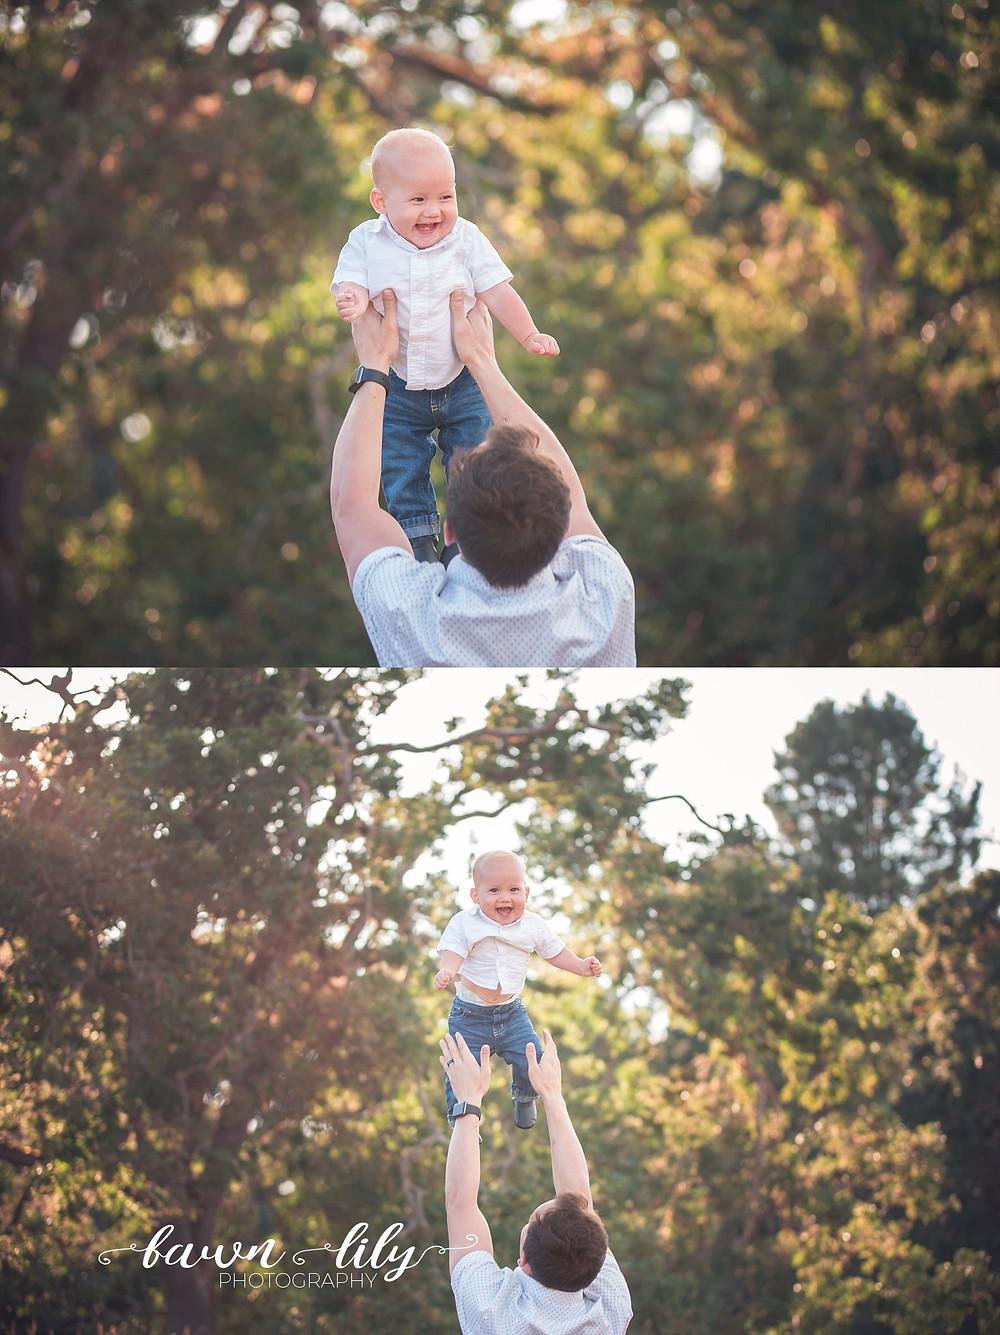 Children photographer, Family photographer, Milestone phootshoot, Family pictures Victoria BC